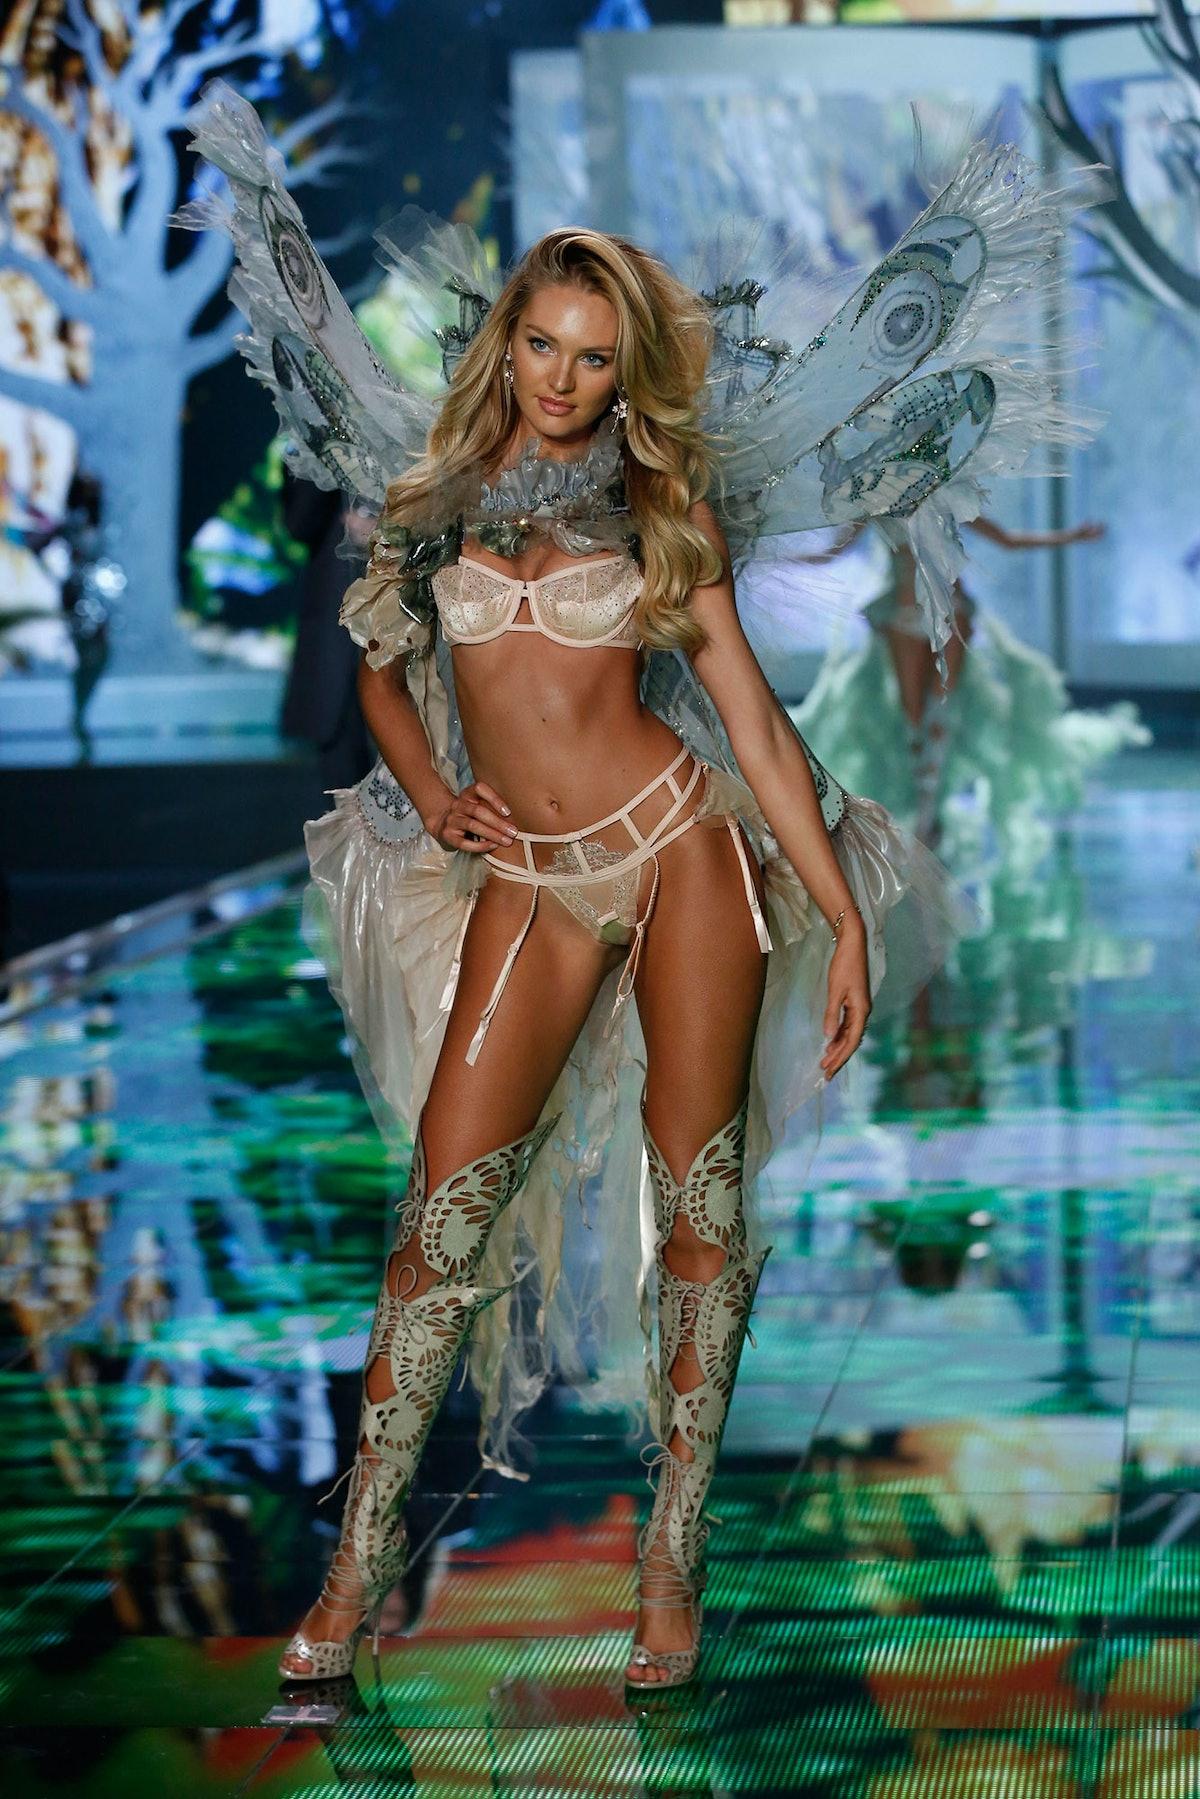 Candice Swanepoel walks in the 2014 Victoria's Secret Fashion Show